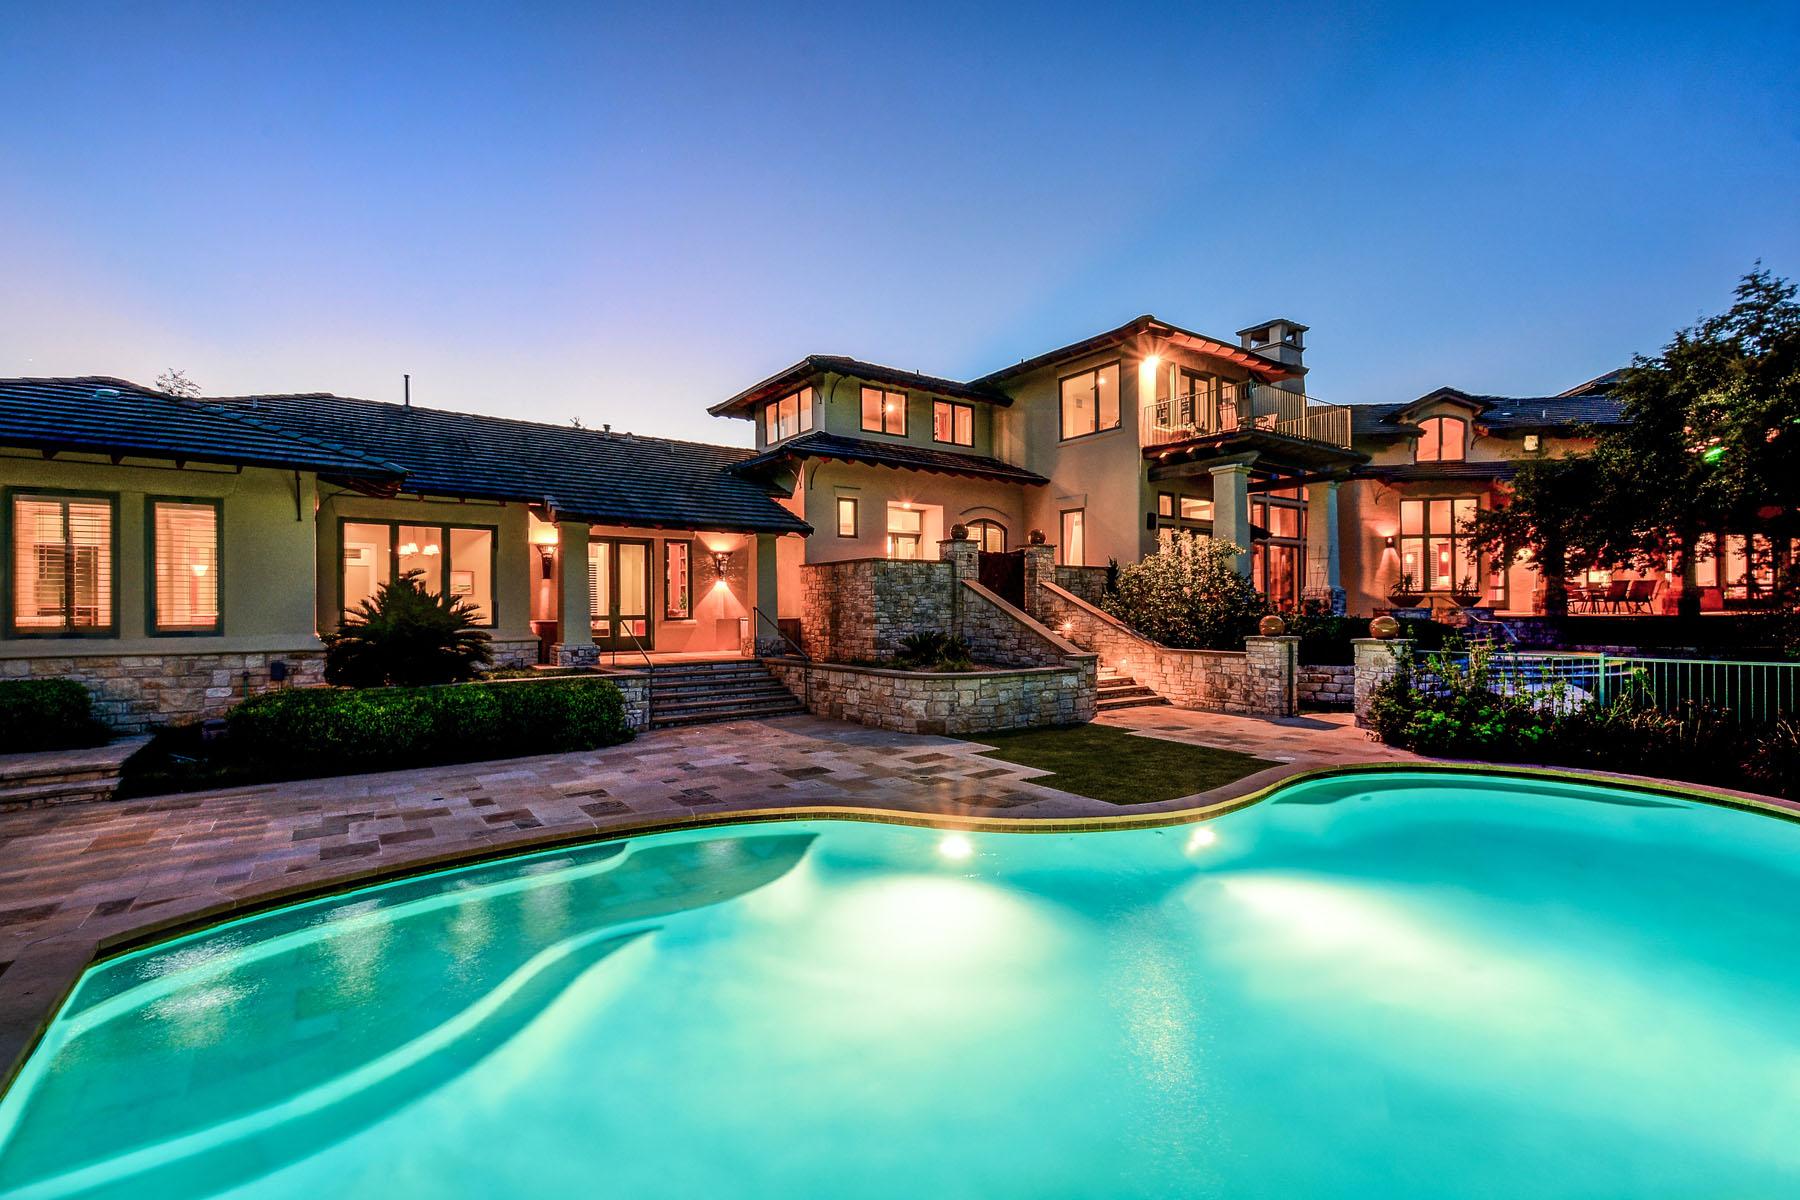 Single Family Home for Sale at Sprawling Barton Creek Estate 8606 Navidad Dr Austin, Texas 78735 United States